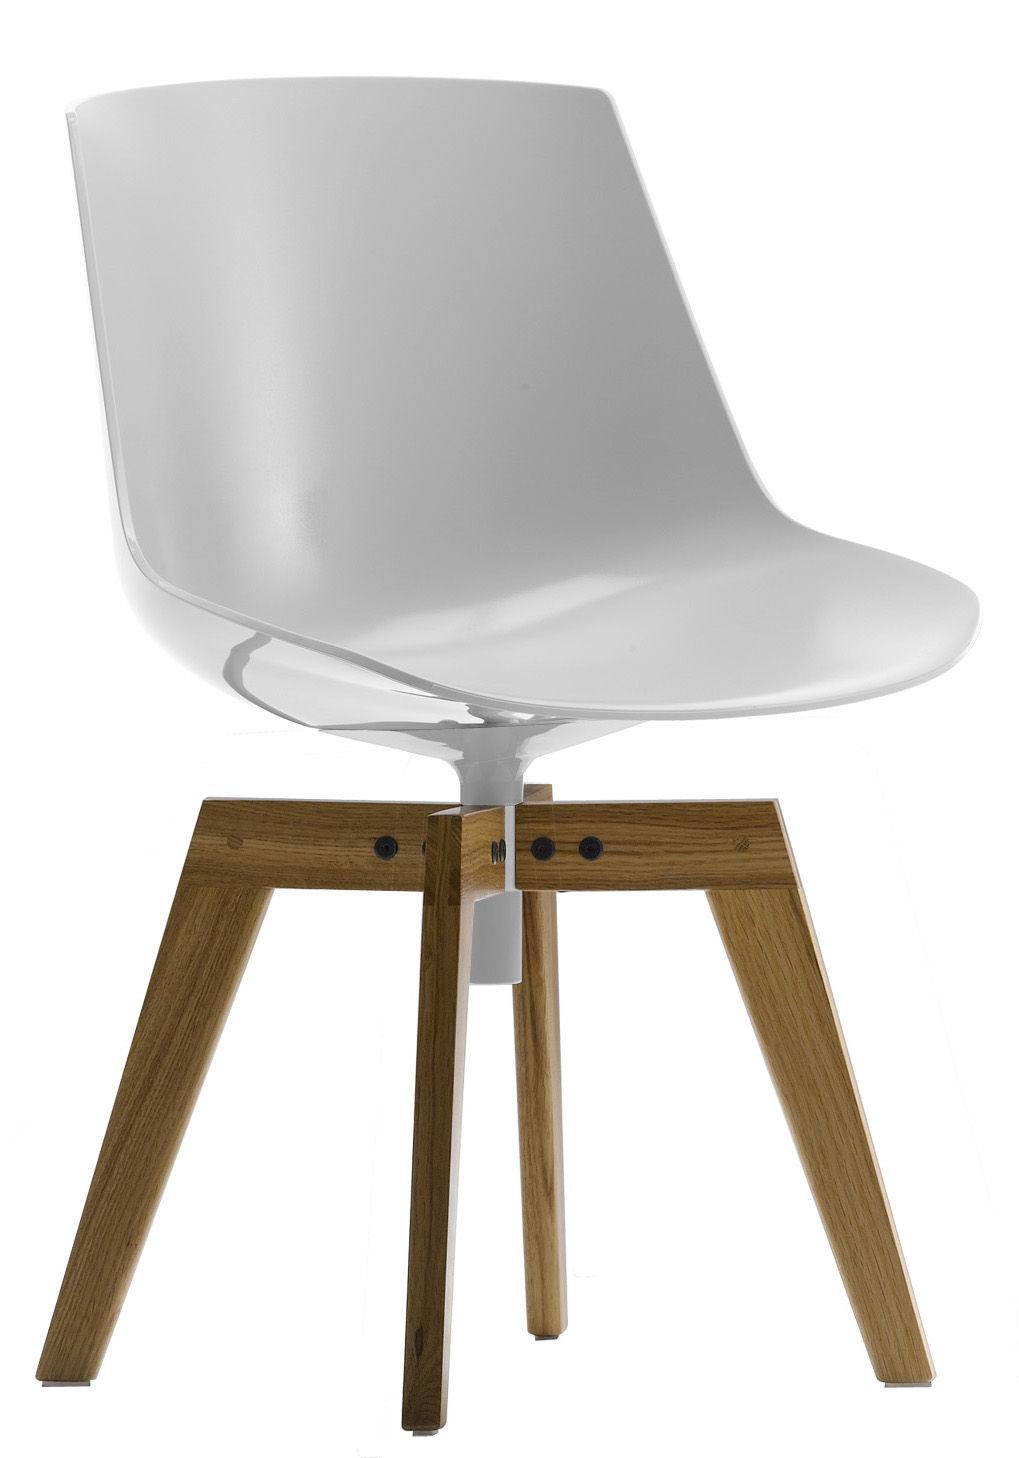 Furniture - Chairs - Flow Swivel chair - 4 oak legs by MDF Italia - White shell / Natural oak frame - Oak, Polycarbonate